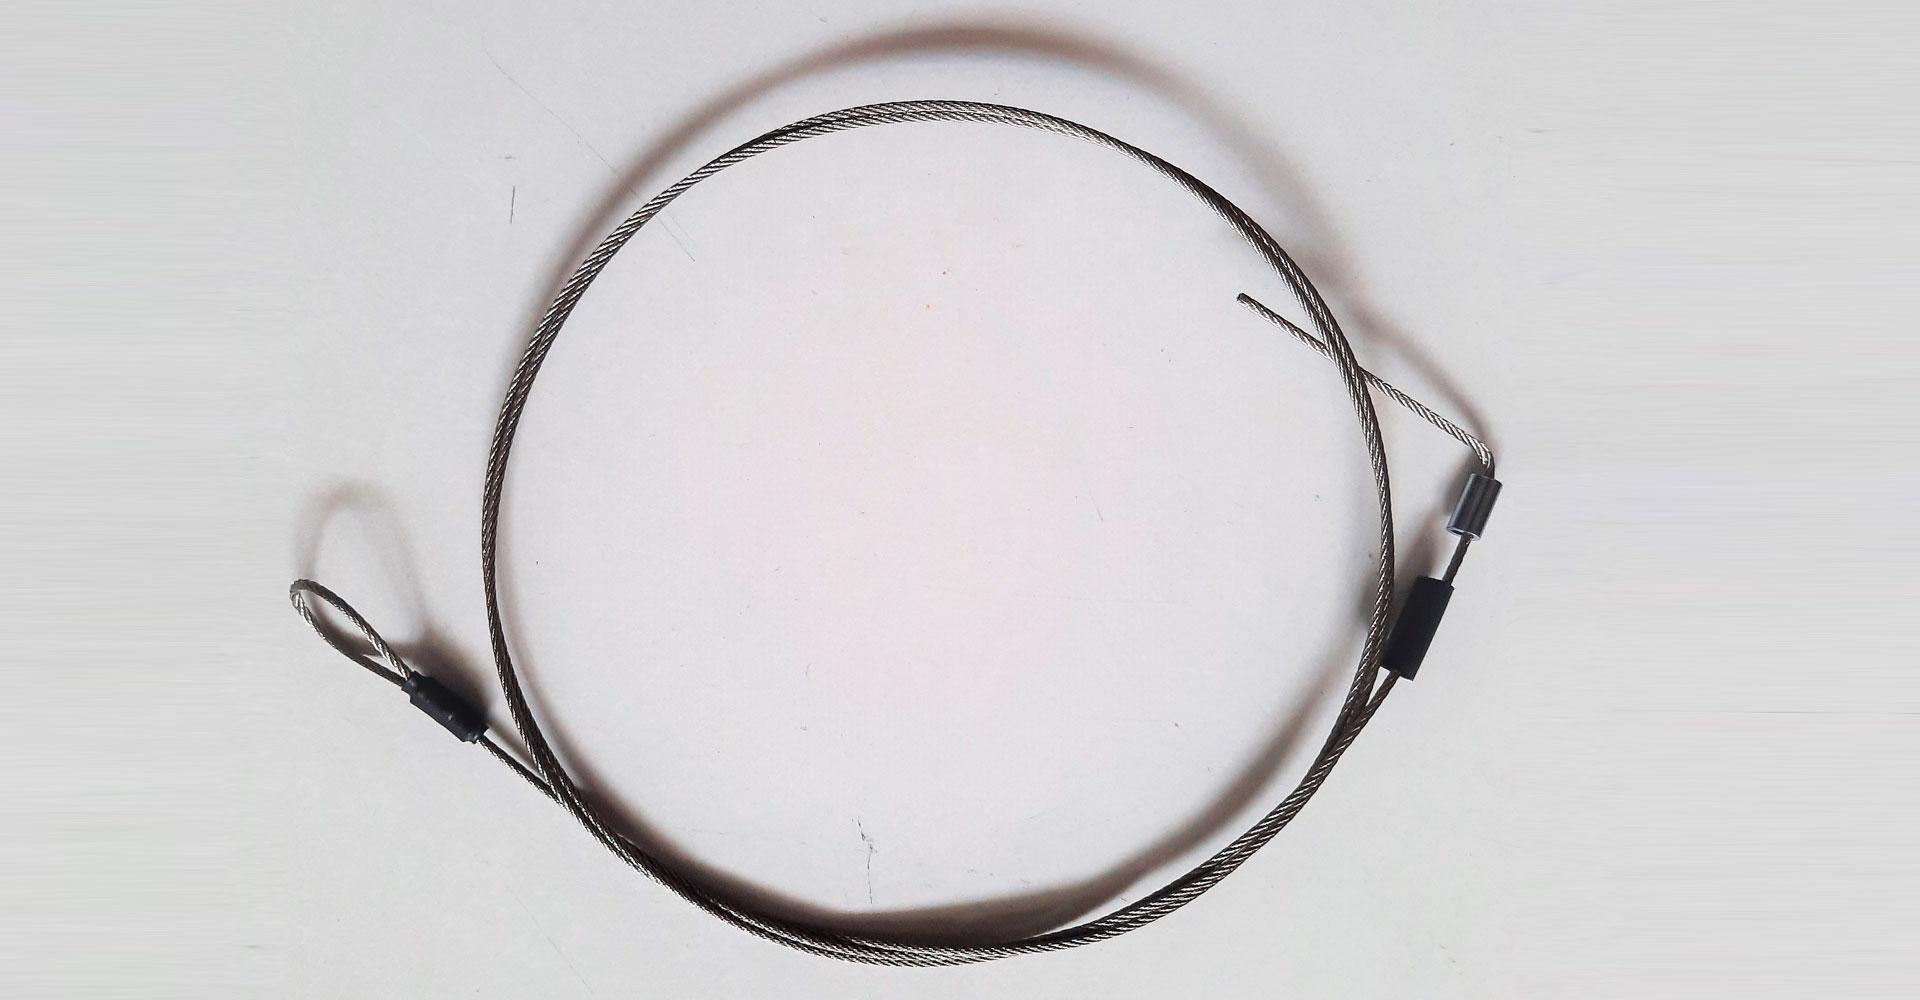 Art 510 – Sartiola preventor (volante – crocetta) fune acc.inox diam. 1.5 mm.